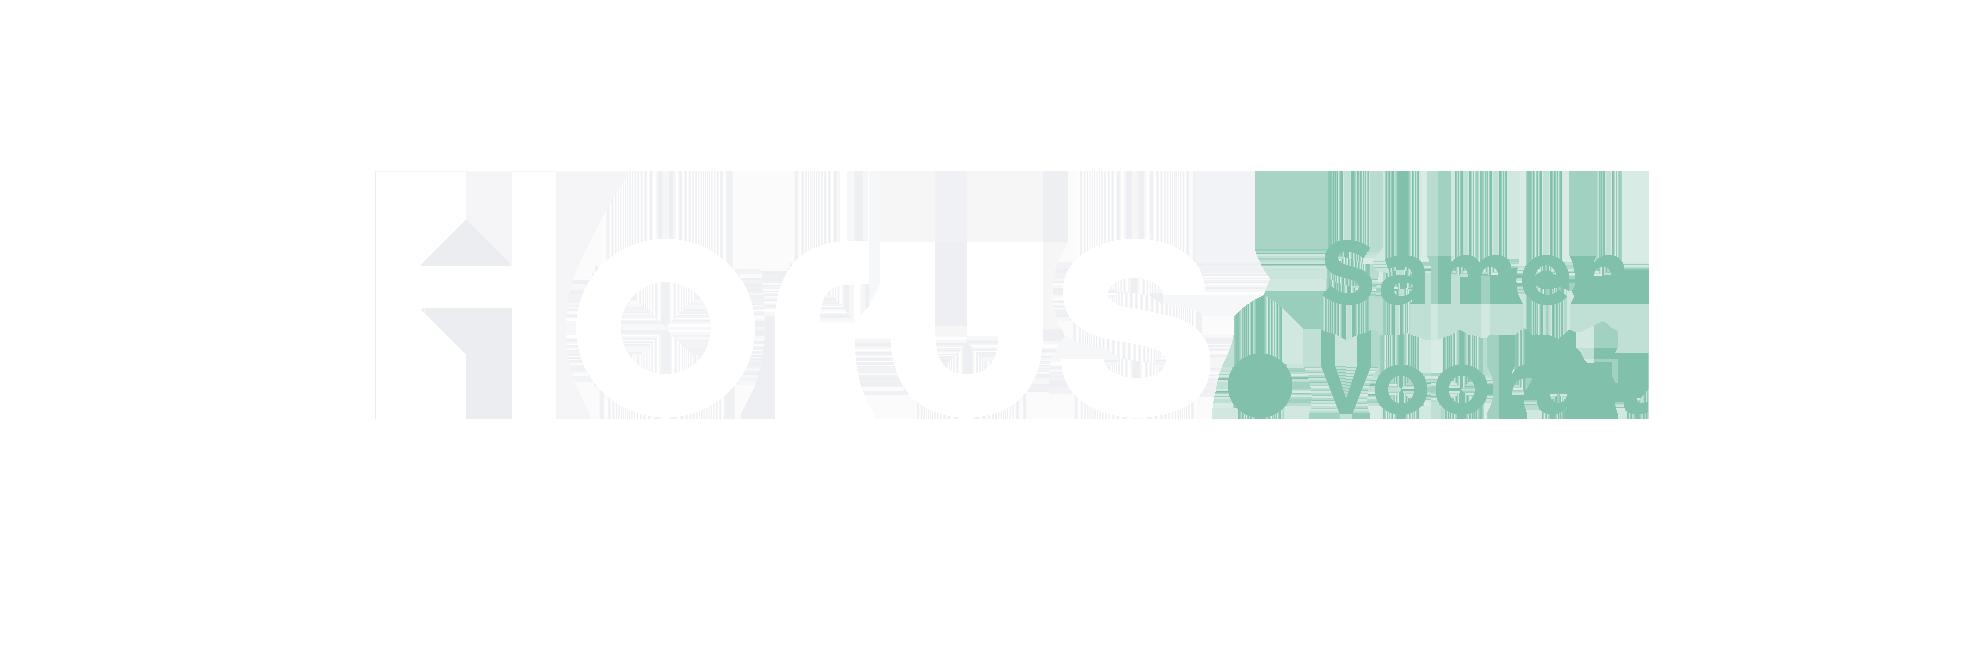 Horus branchevereniging